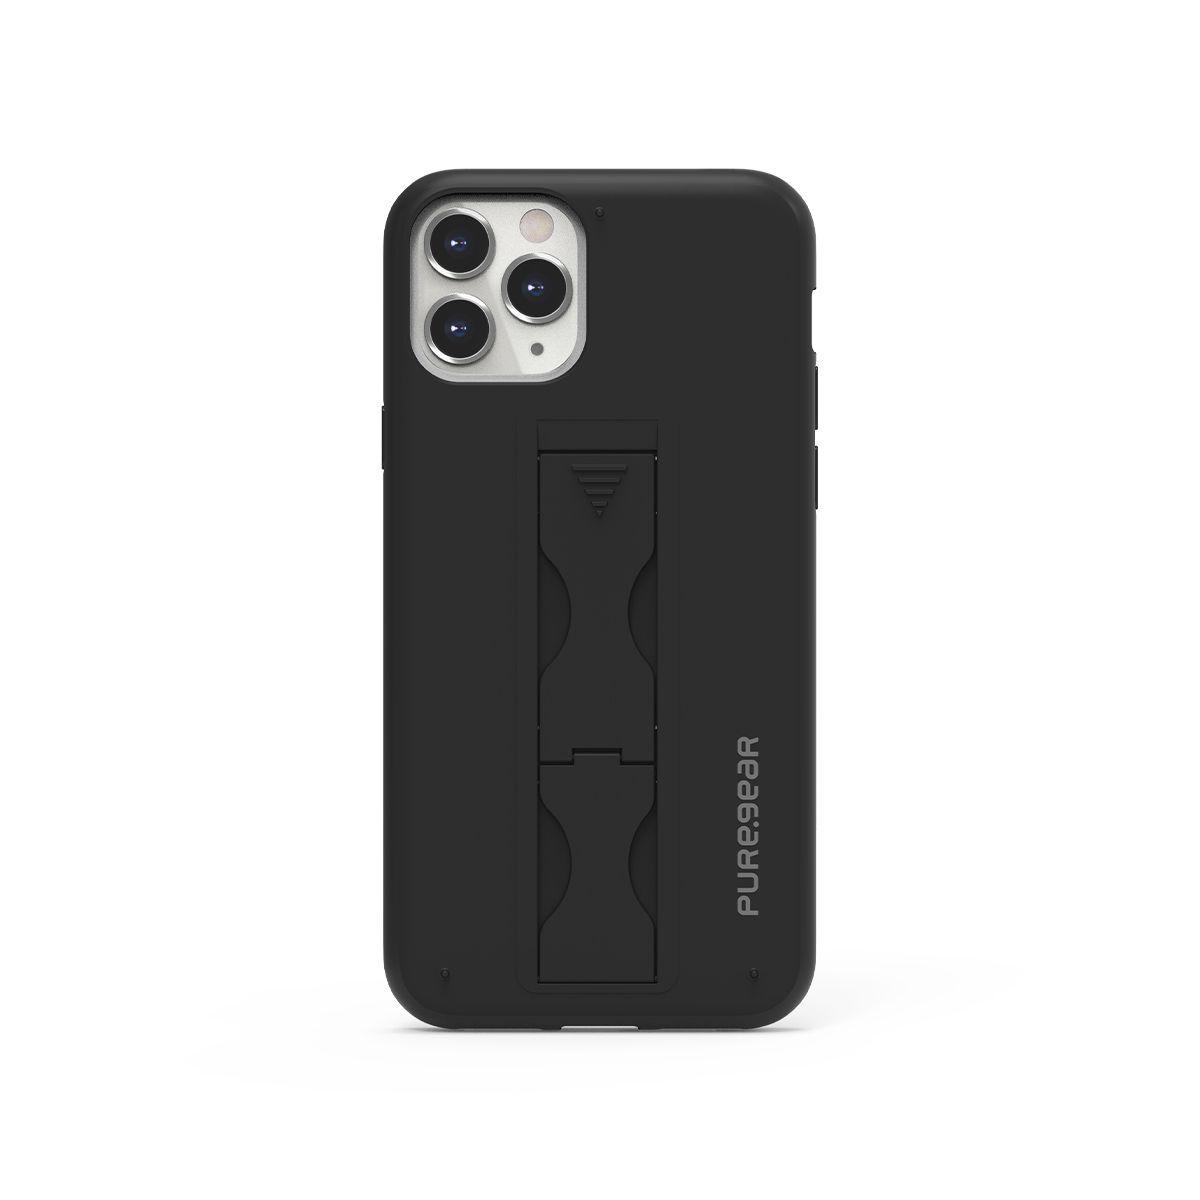 Apple iPhone 11 Pro SlimStik, Antimicrobial Kickstand Case – Black